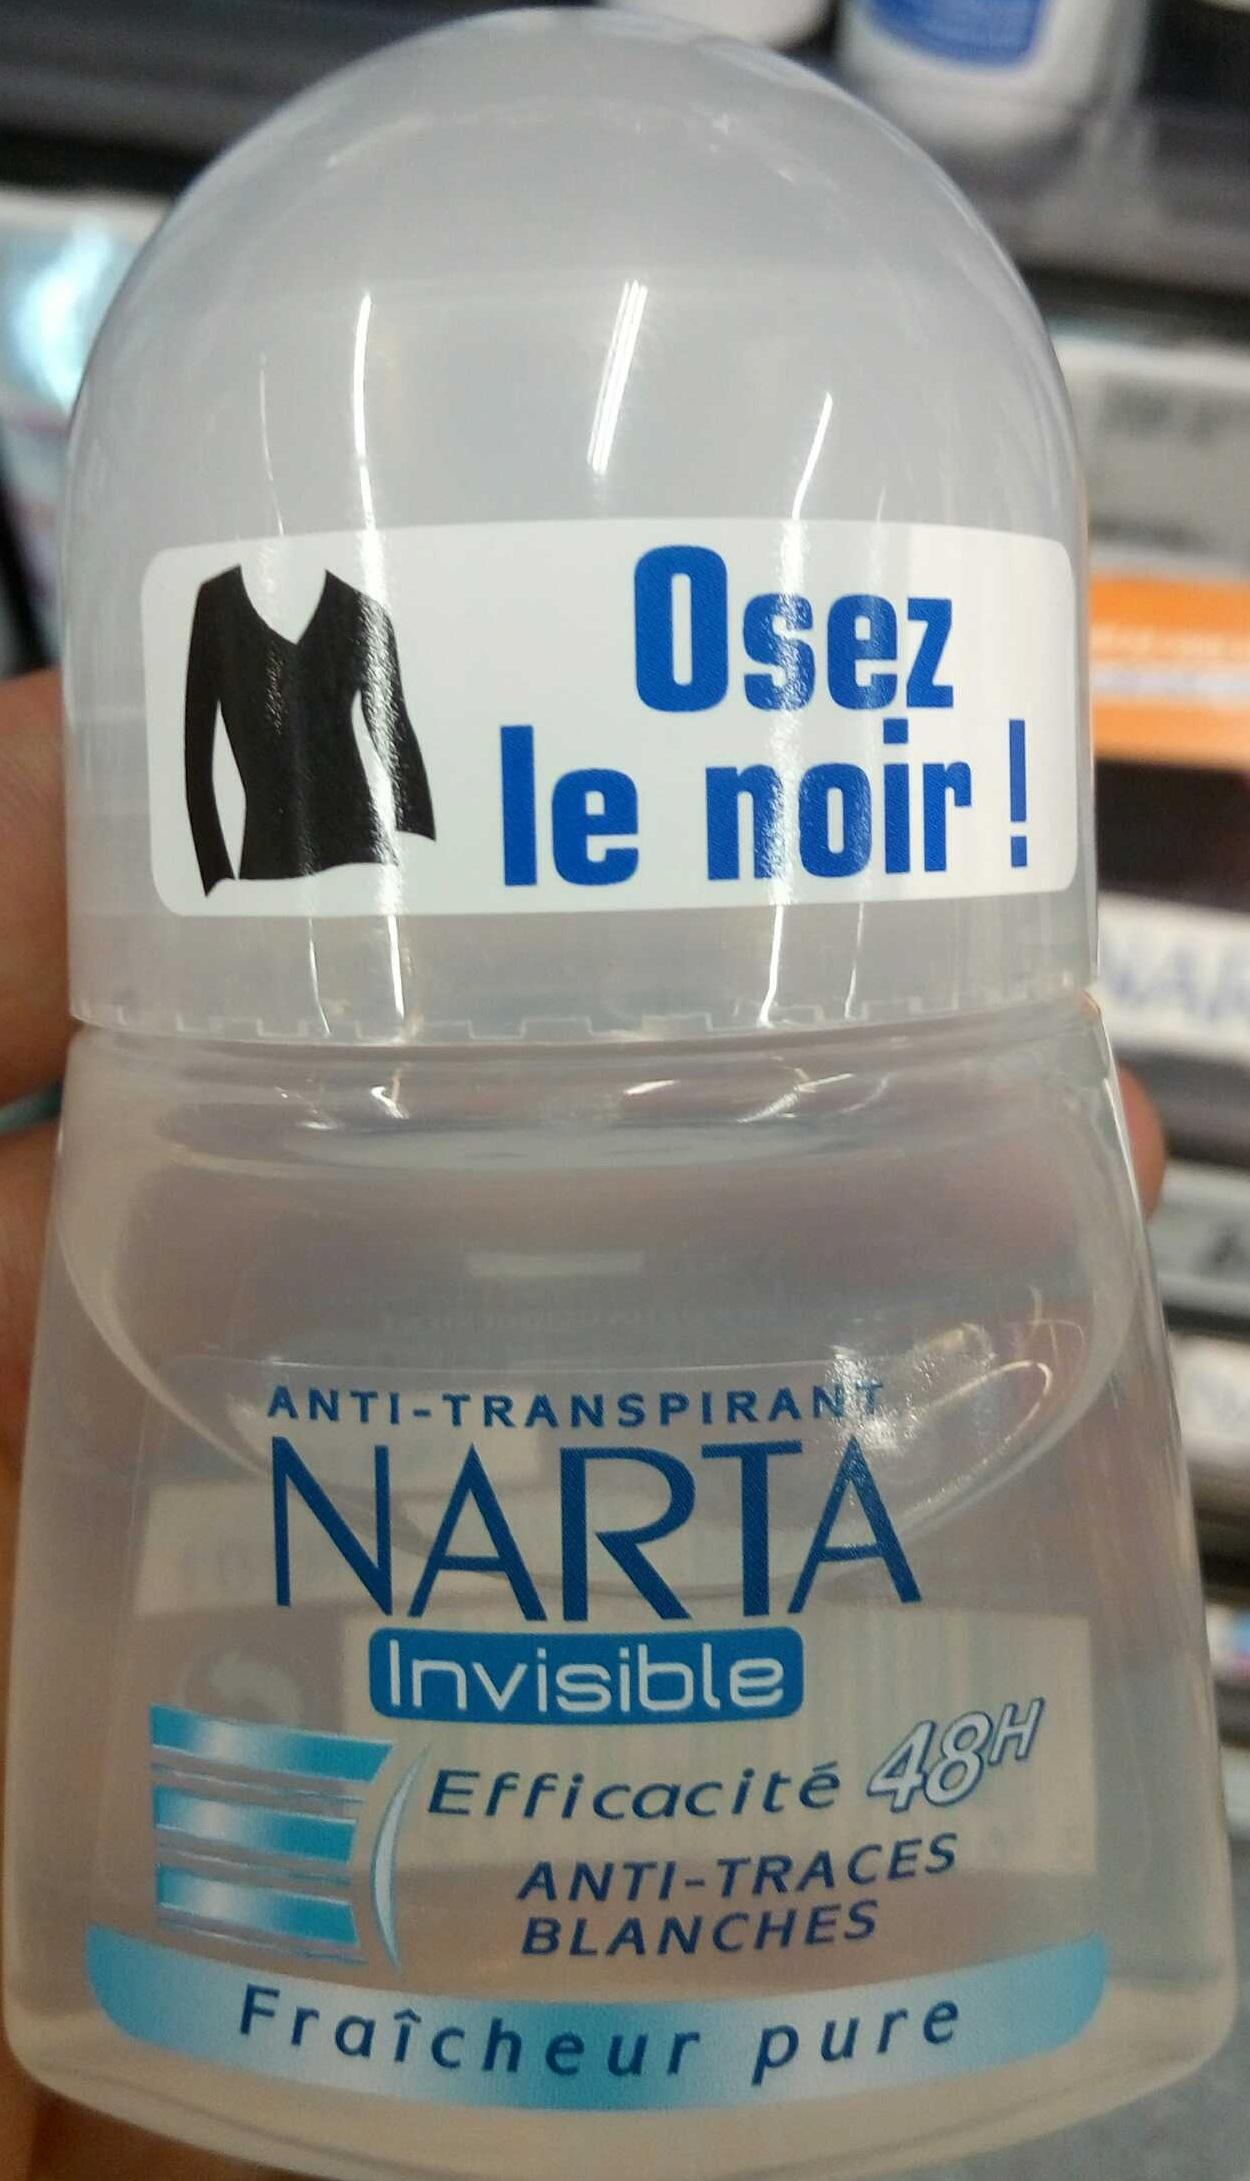 Anti-Tranpirant Invisible Fraîcheur pure 48H - Product - fr